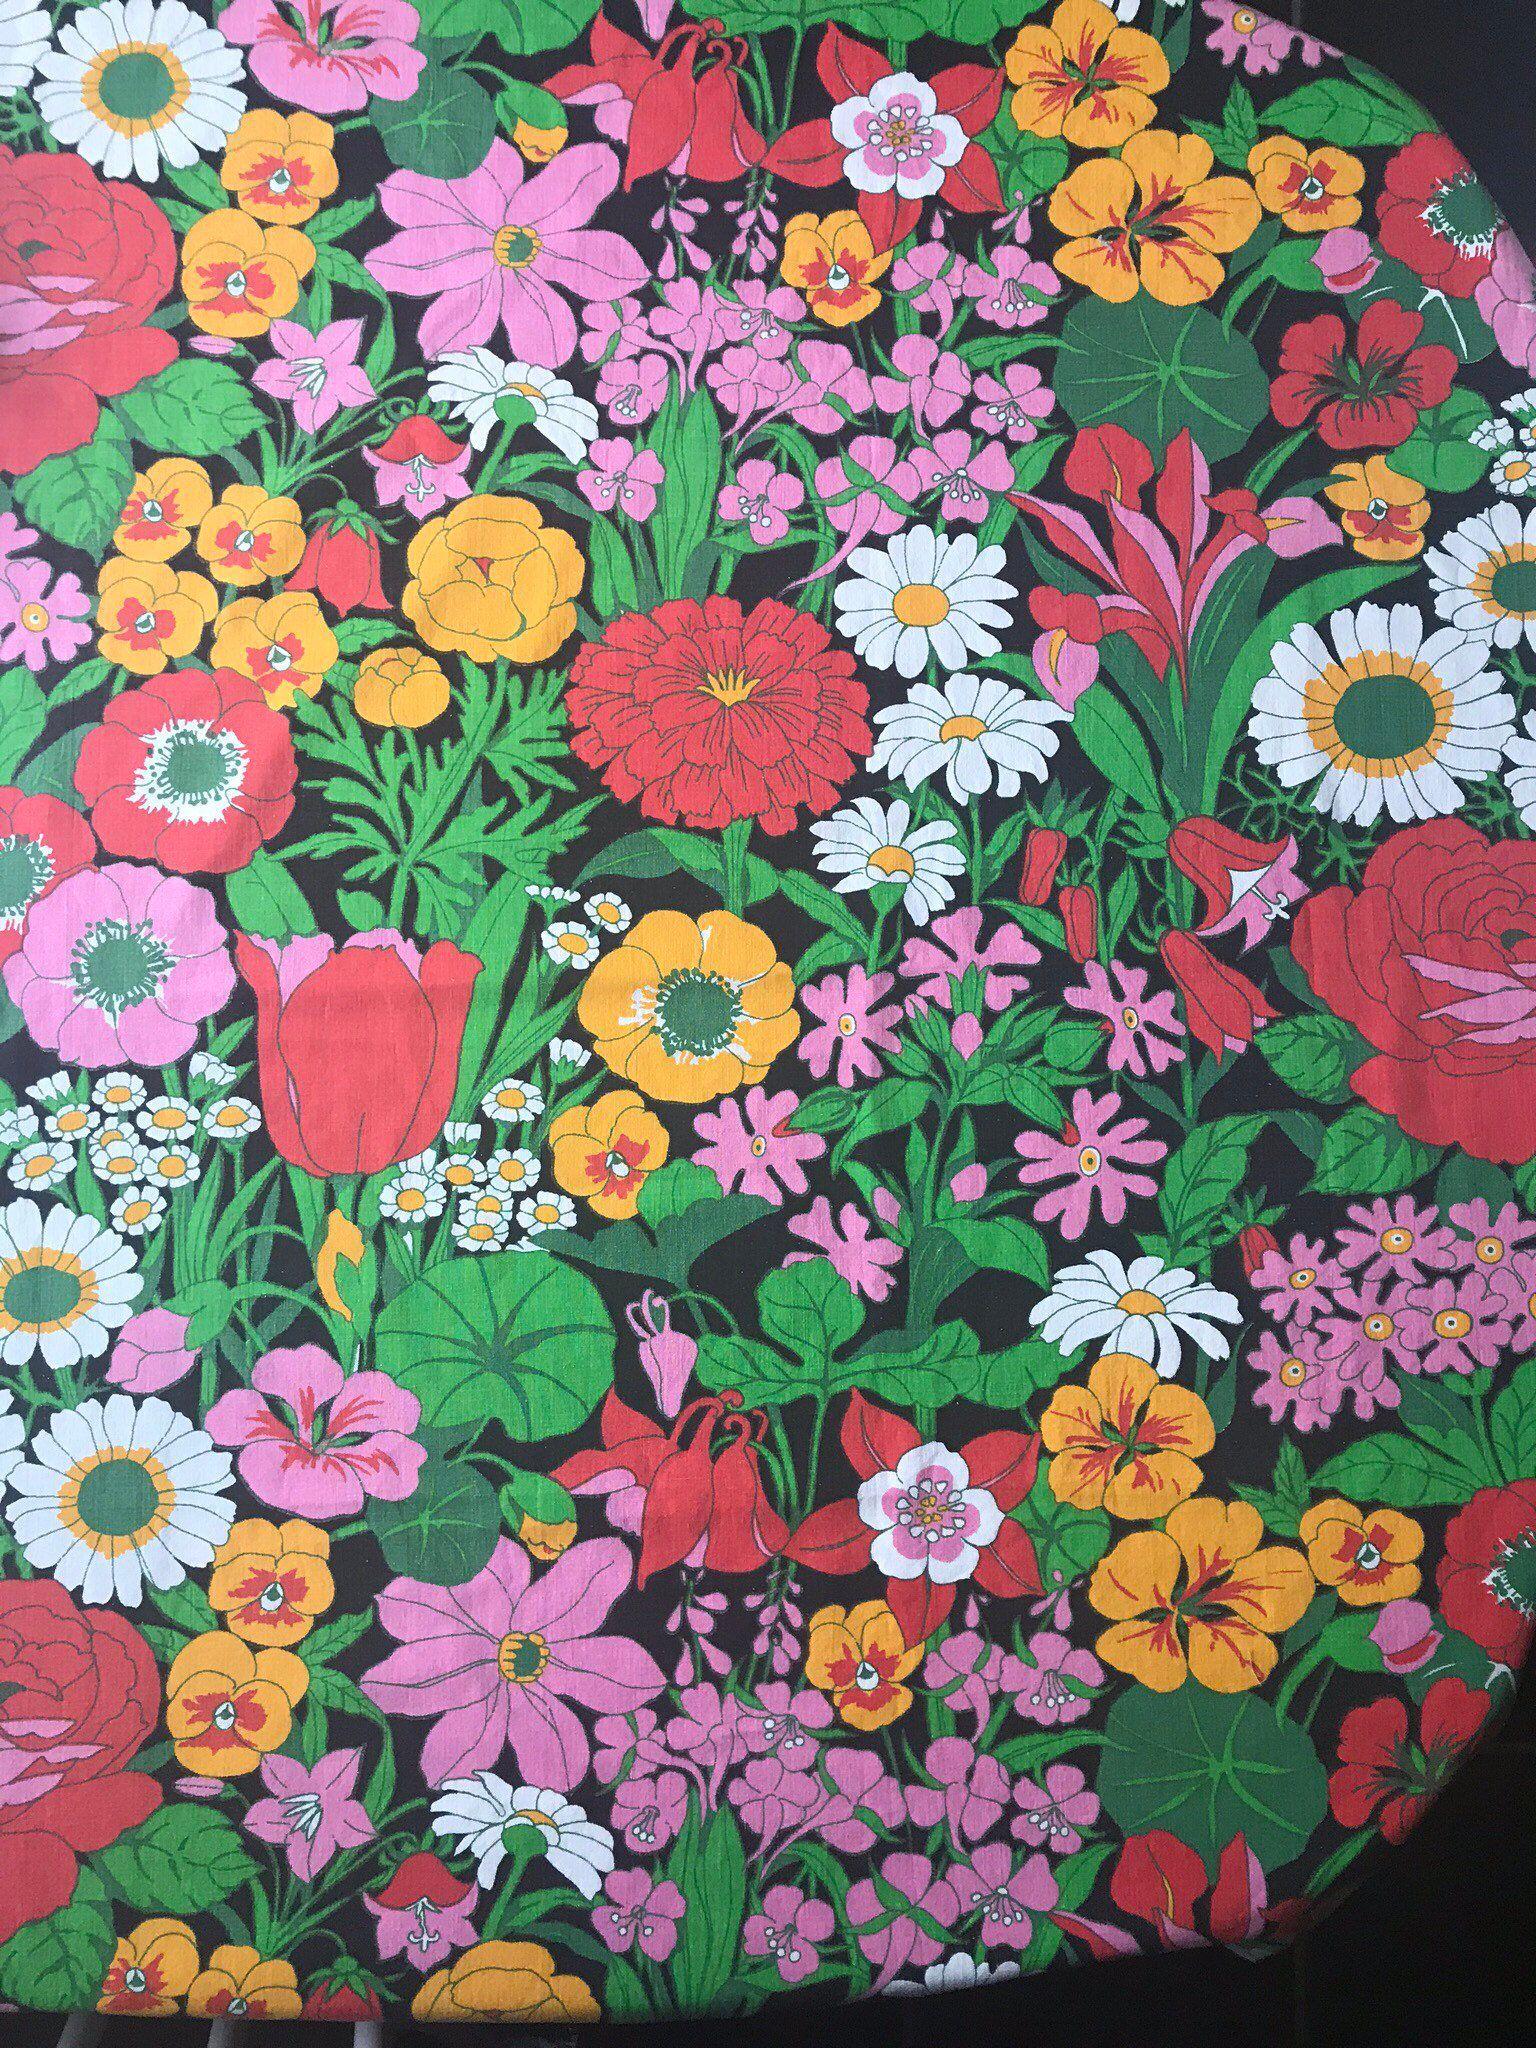 1970s Vintage Fabric Scandinavian Craft RETRO Design Colorful Flower